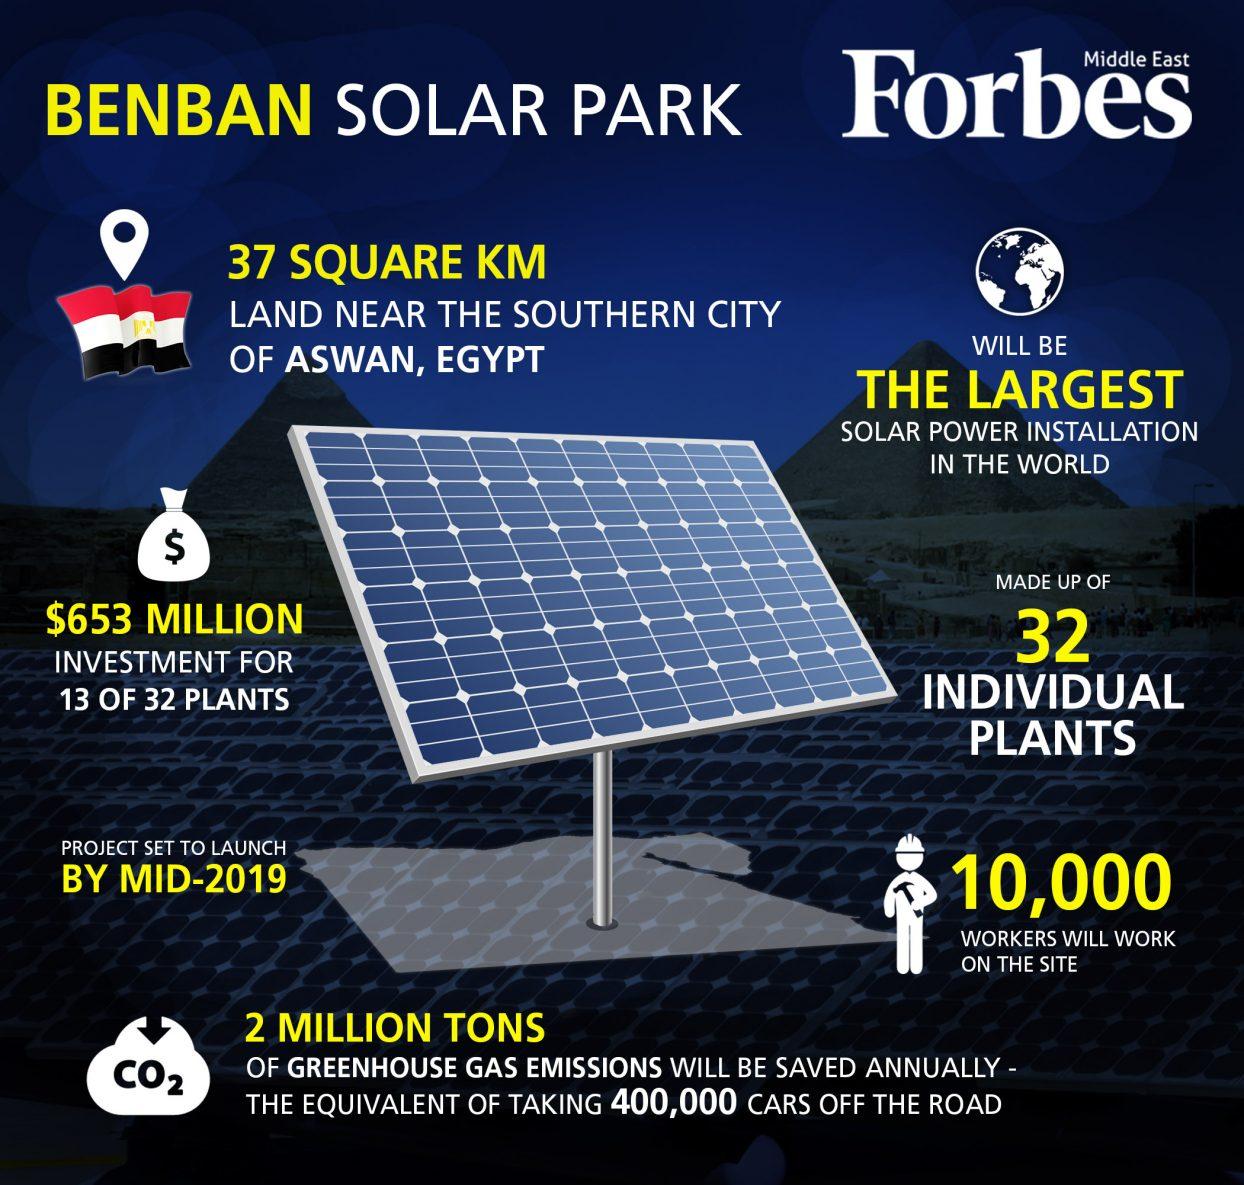 benban solar park 1244x1185